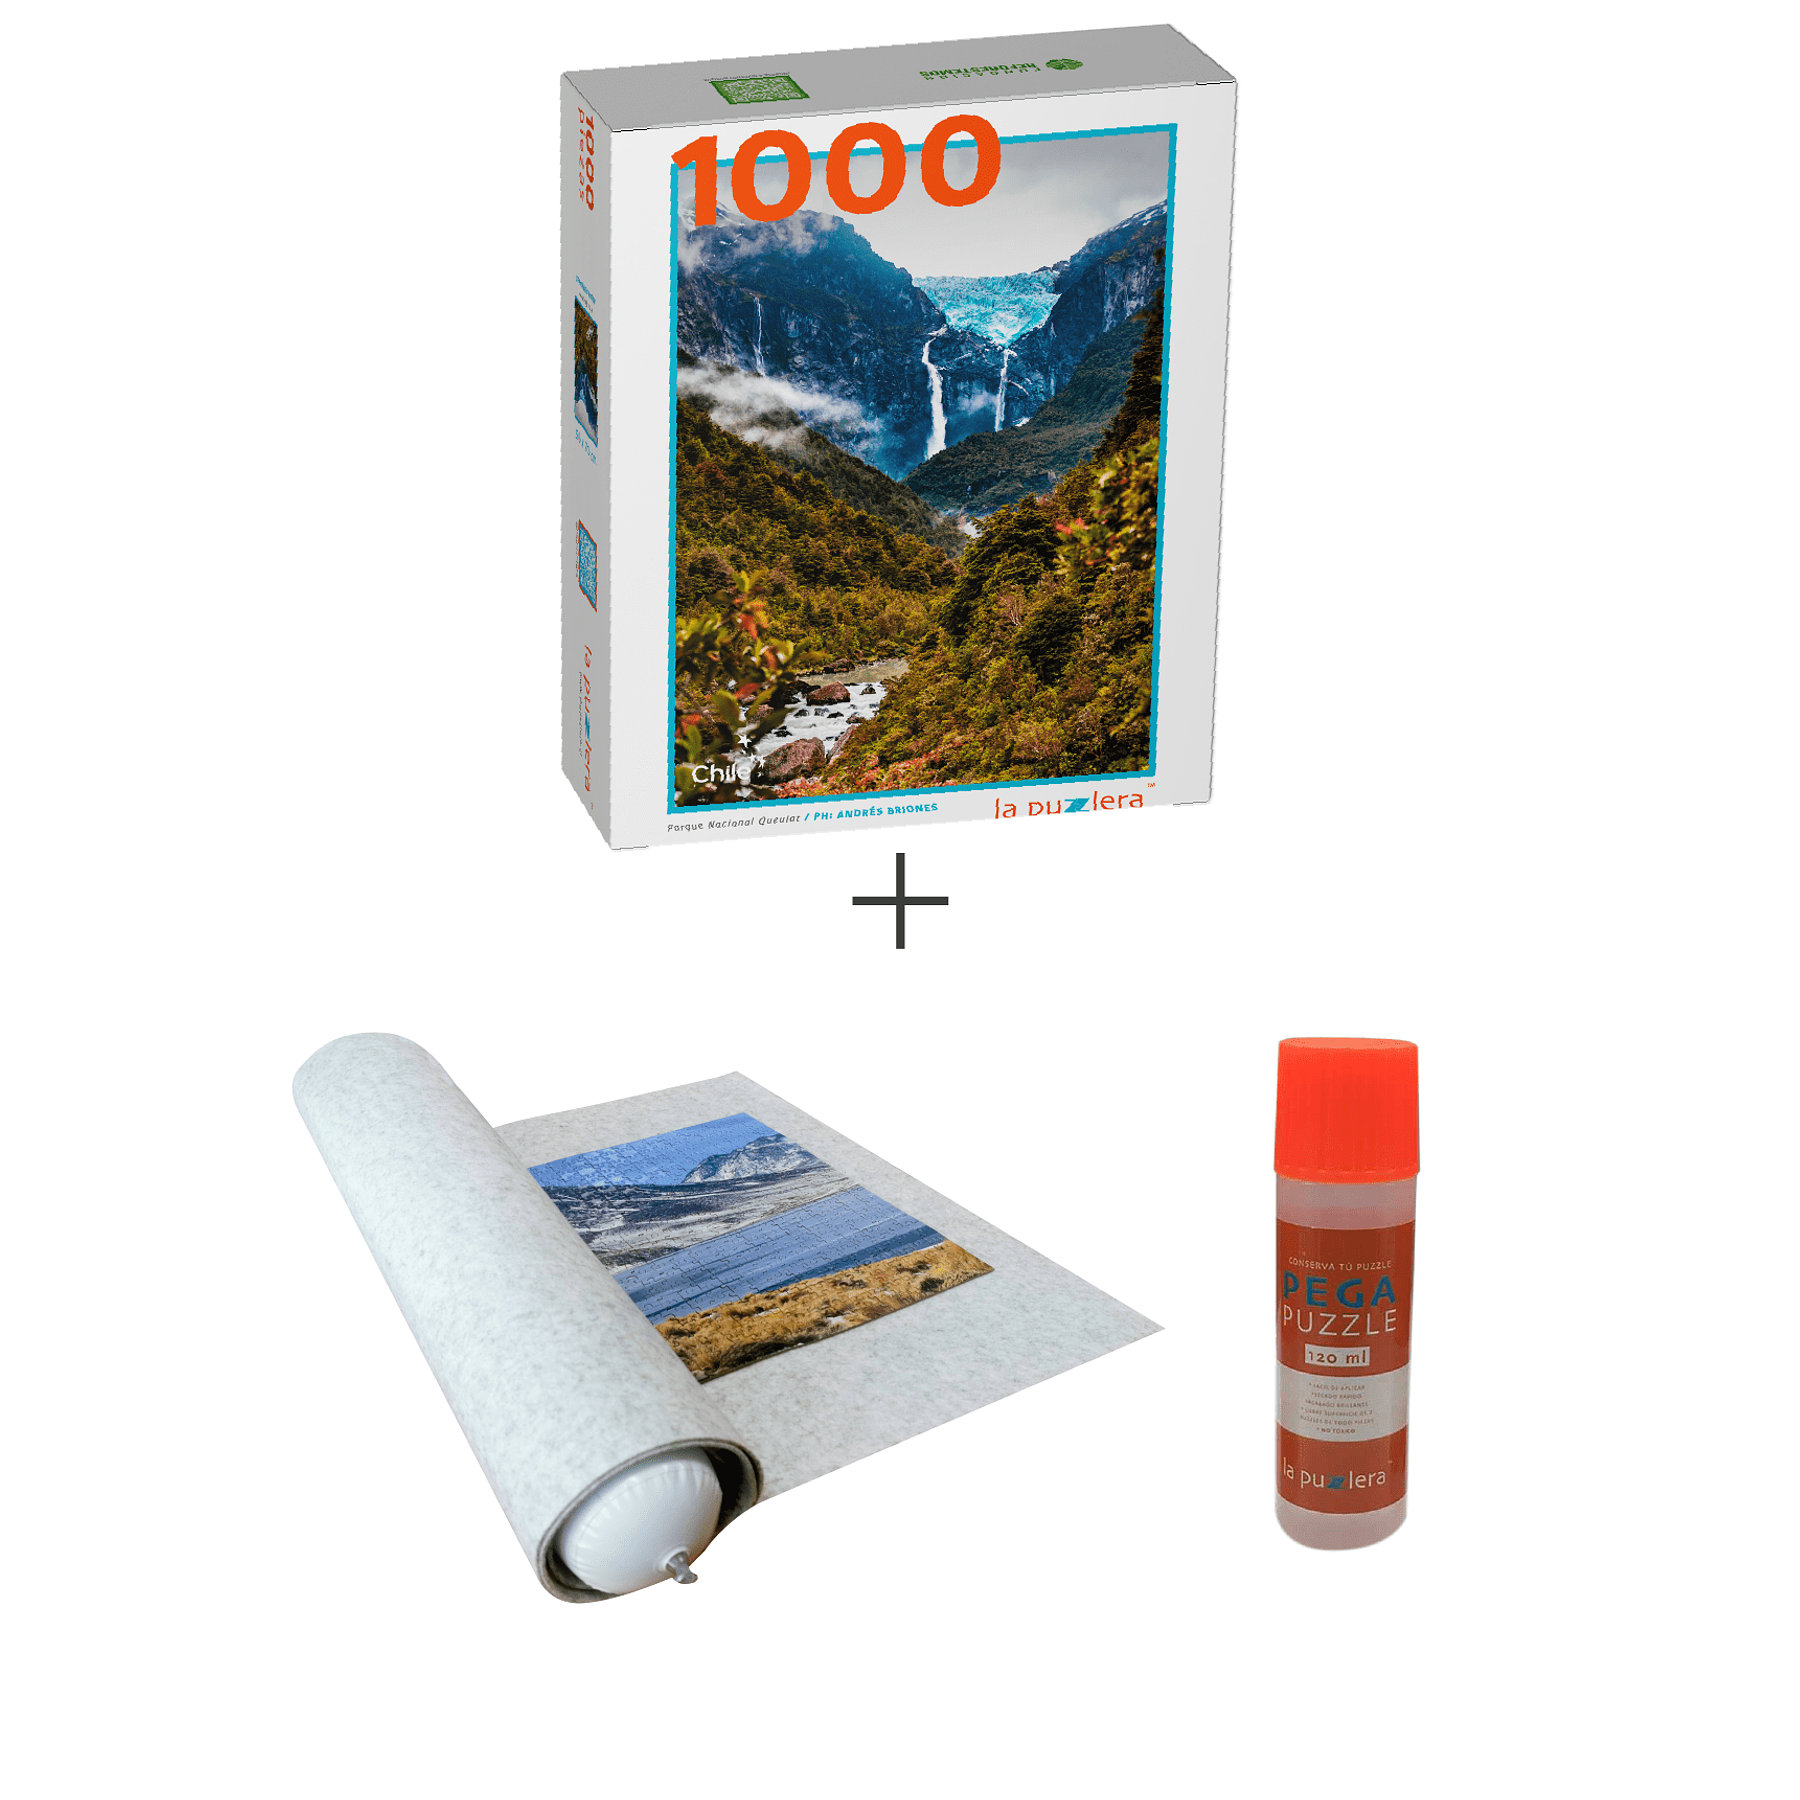 Puzzle 1000 Piezas P.N. de Chile + Puzzle Mat + Pega Puzzle